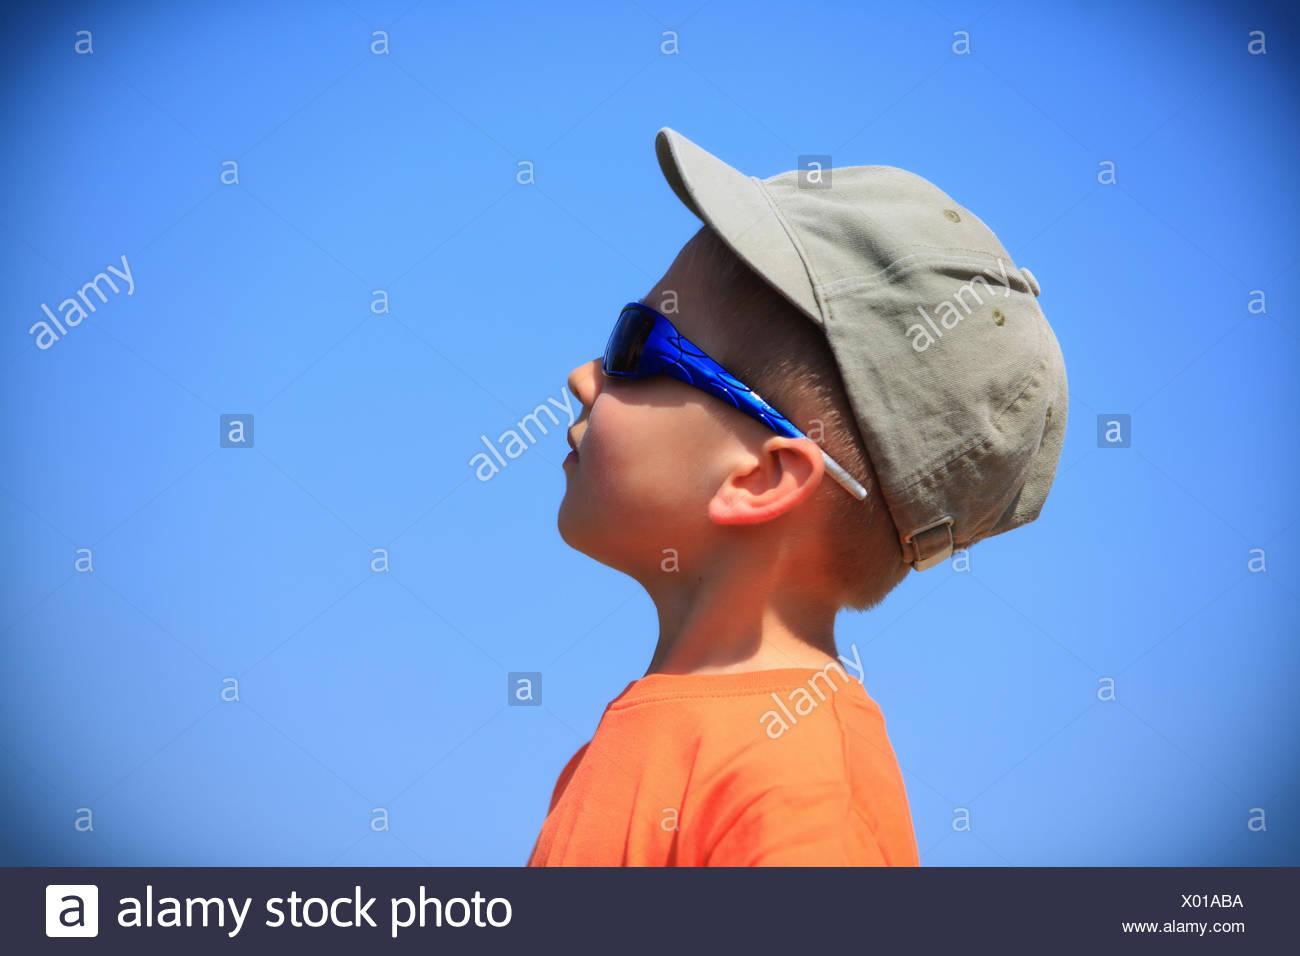 ebc0ad1721e8 Little Boy Kid Sunglasses Cap Stock Photos & Little Boy Kid ...